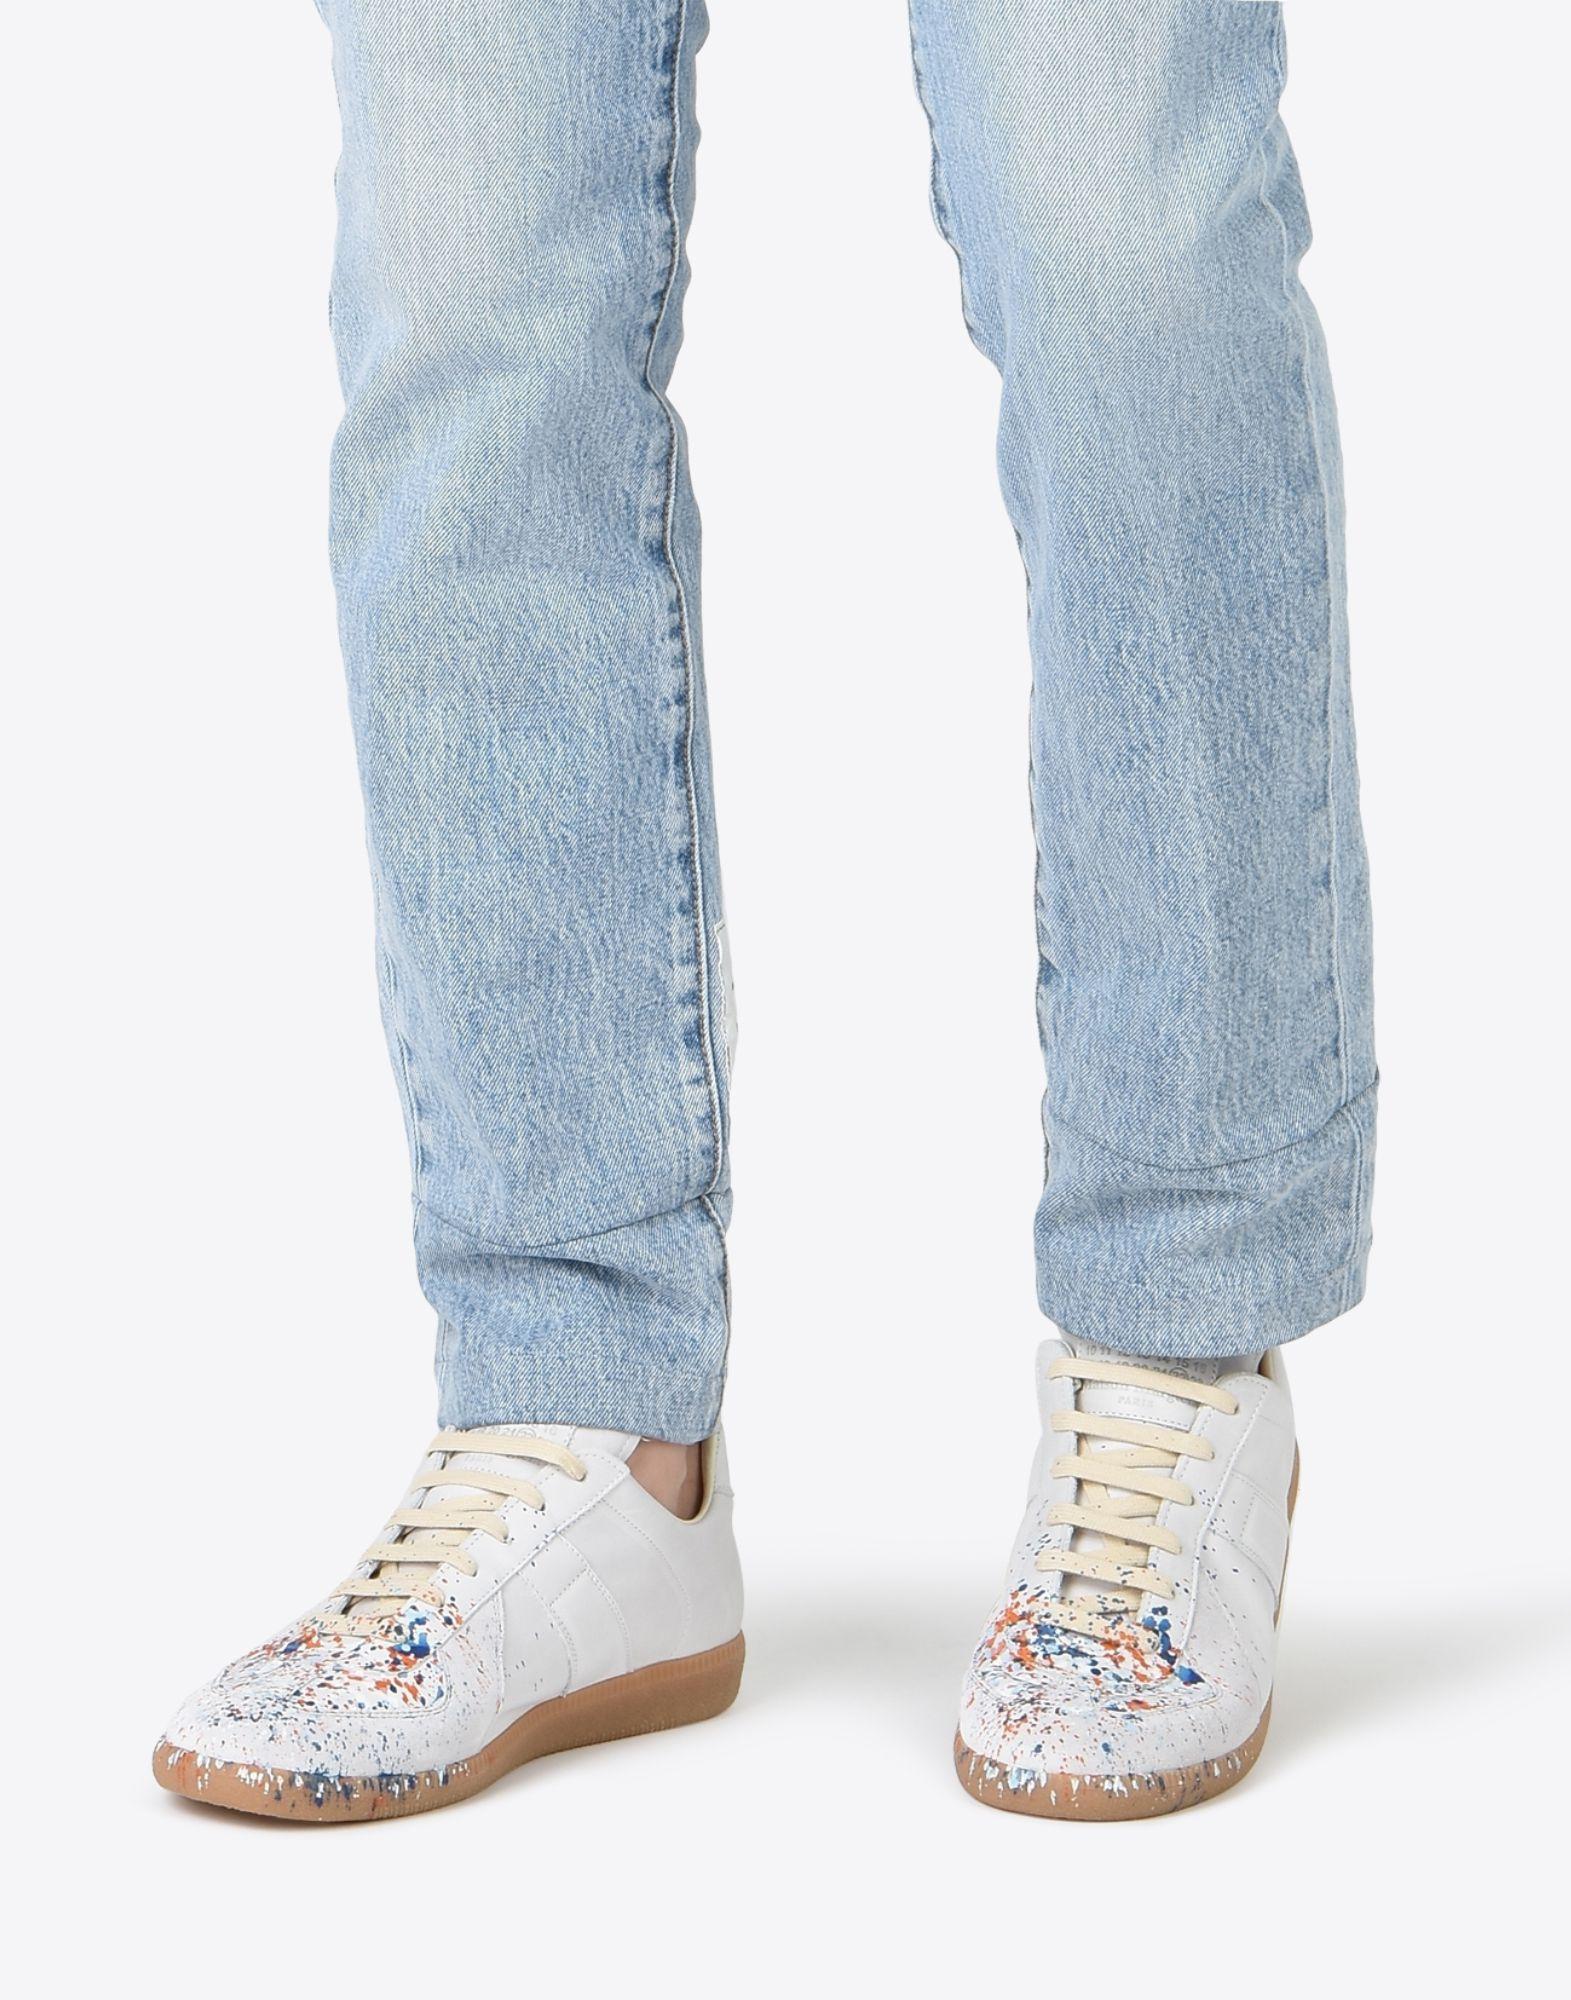 MAISON MARGIELA 'Replica' paint drop sneakers Sneakers Man b